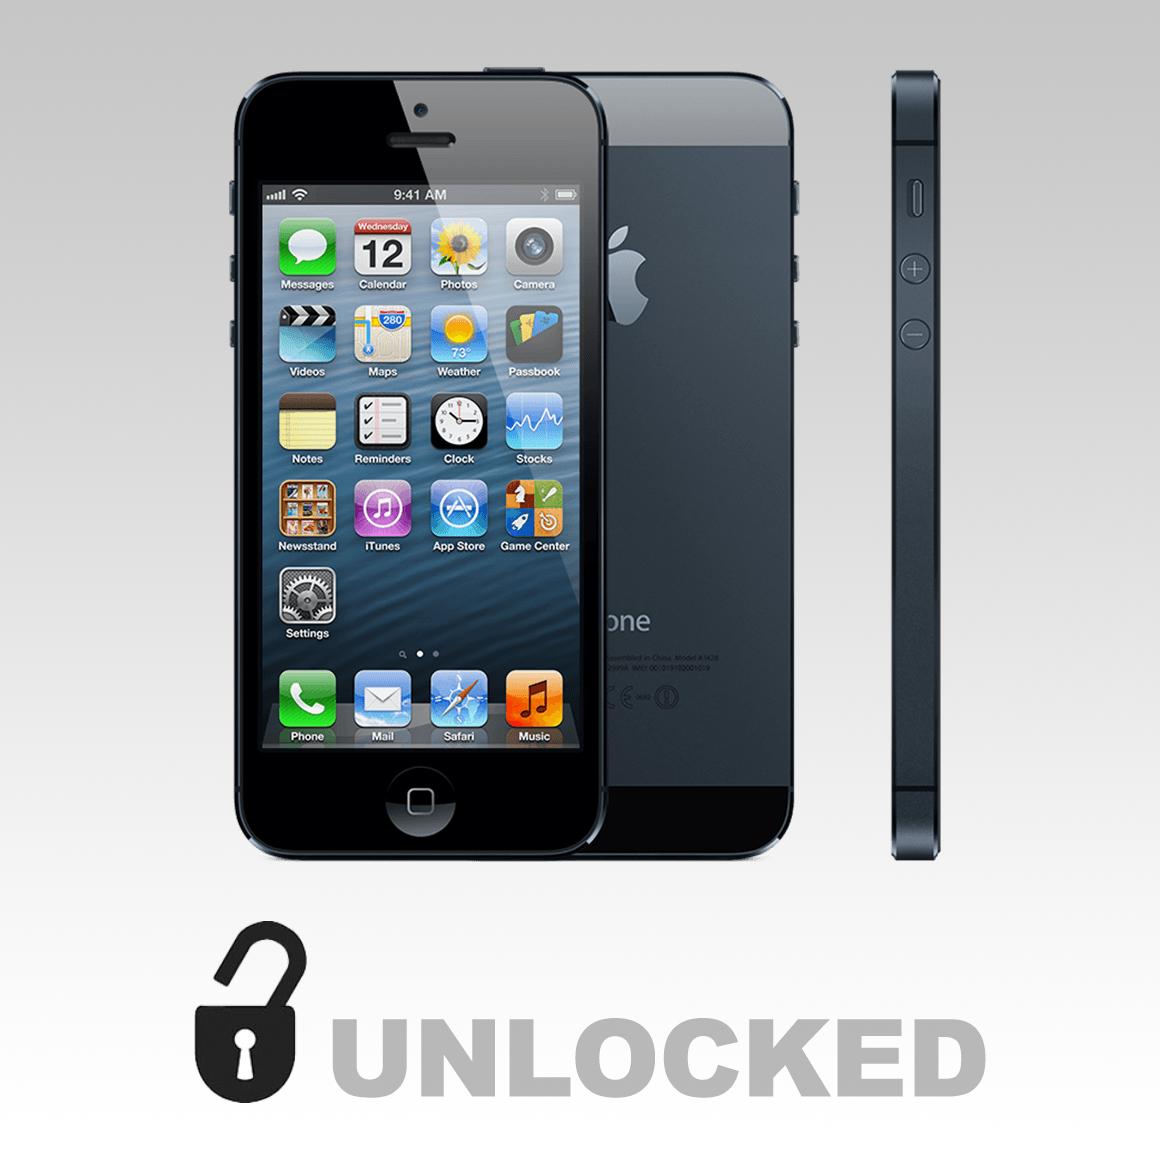 a325c8149ce Apple iPhone 5 UNLOCKED Model GSM